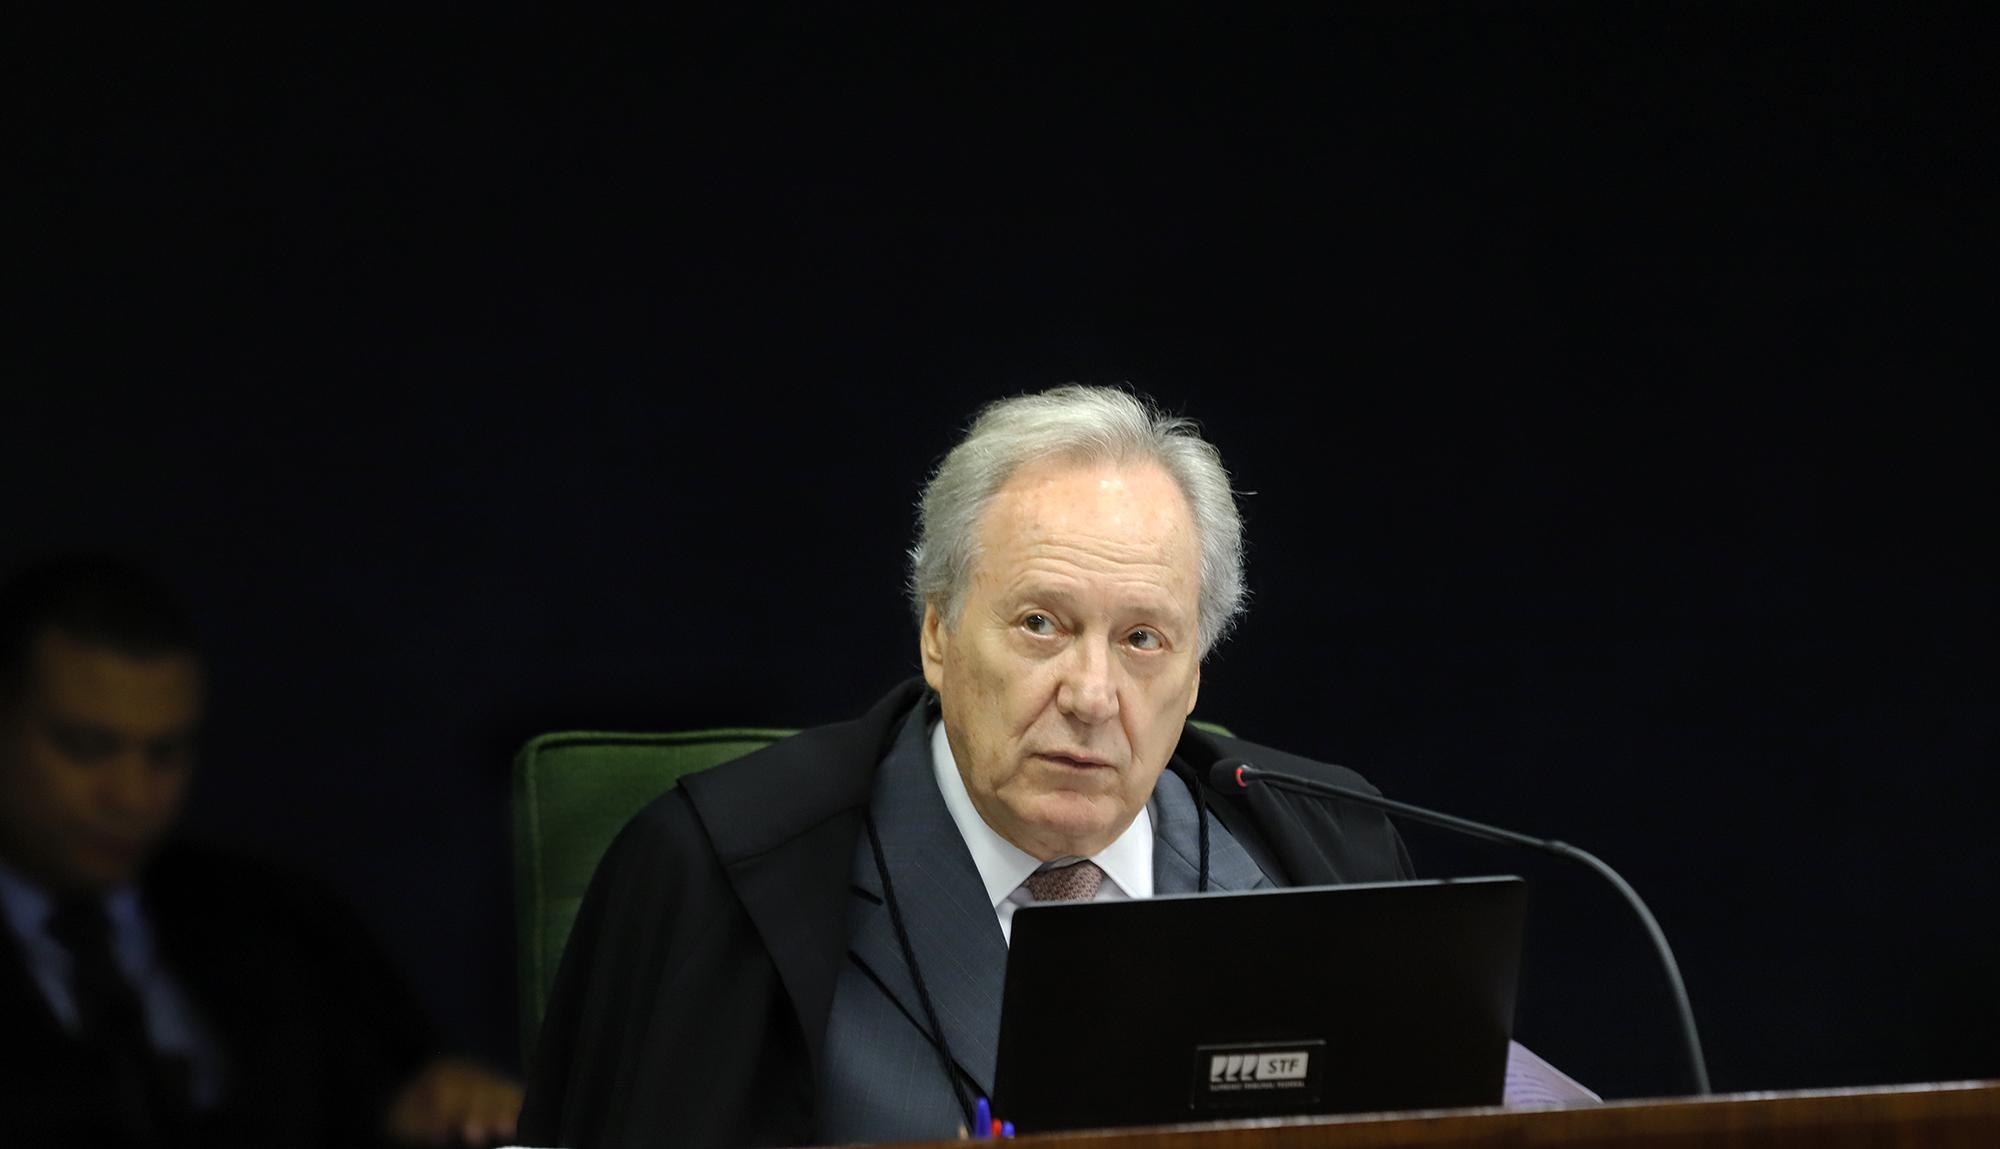 Ministro Ricardo Lewandowski, Supremo Tribunal Federal.